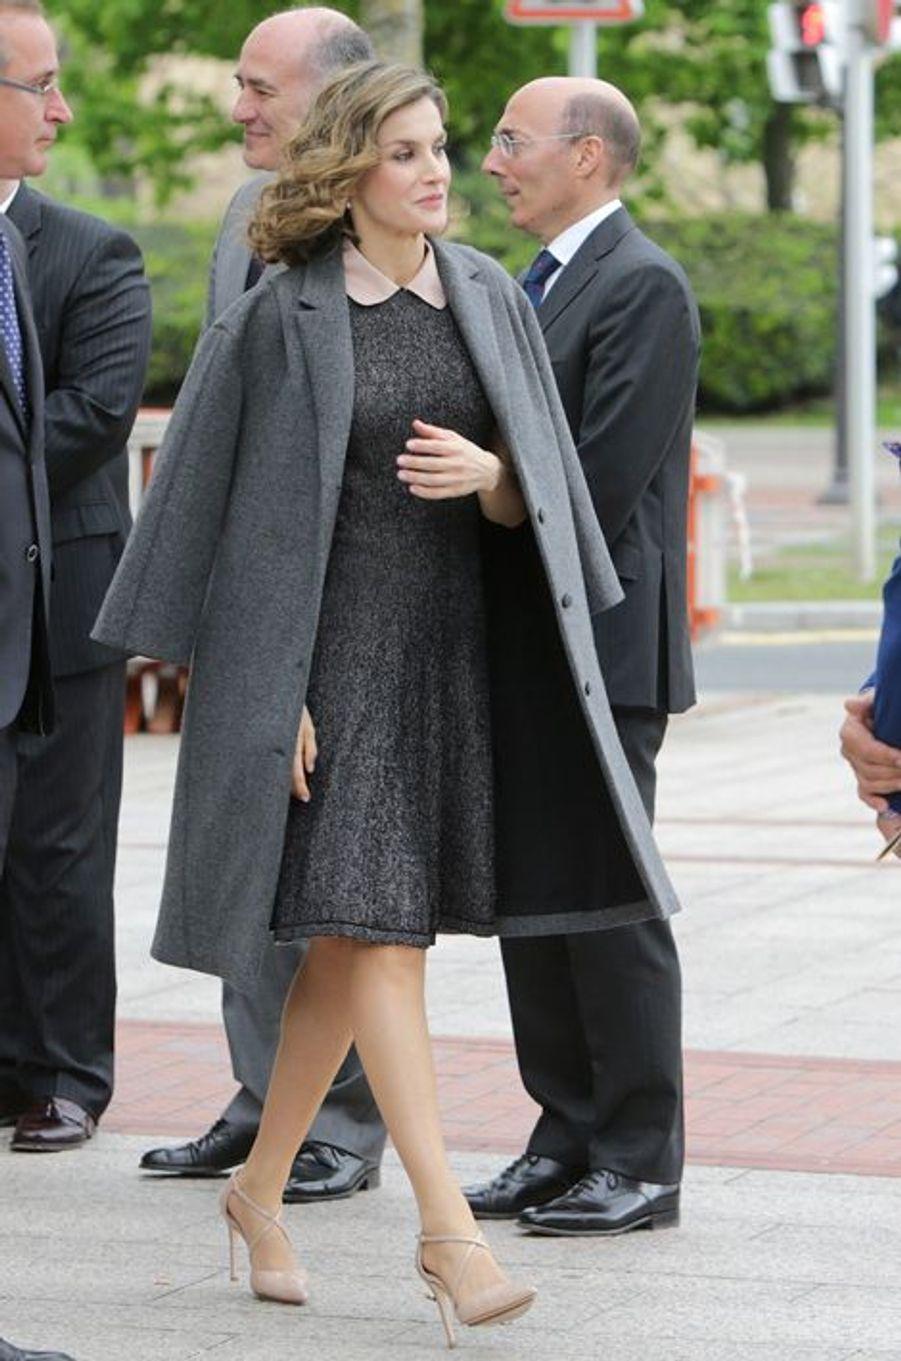 La reine Letizia d'Espagne à Bilbao, le 21 avril 2016